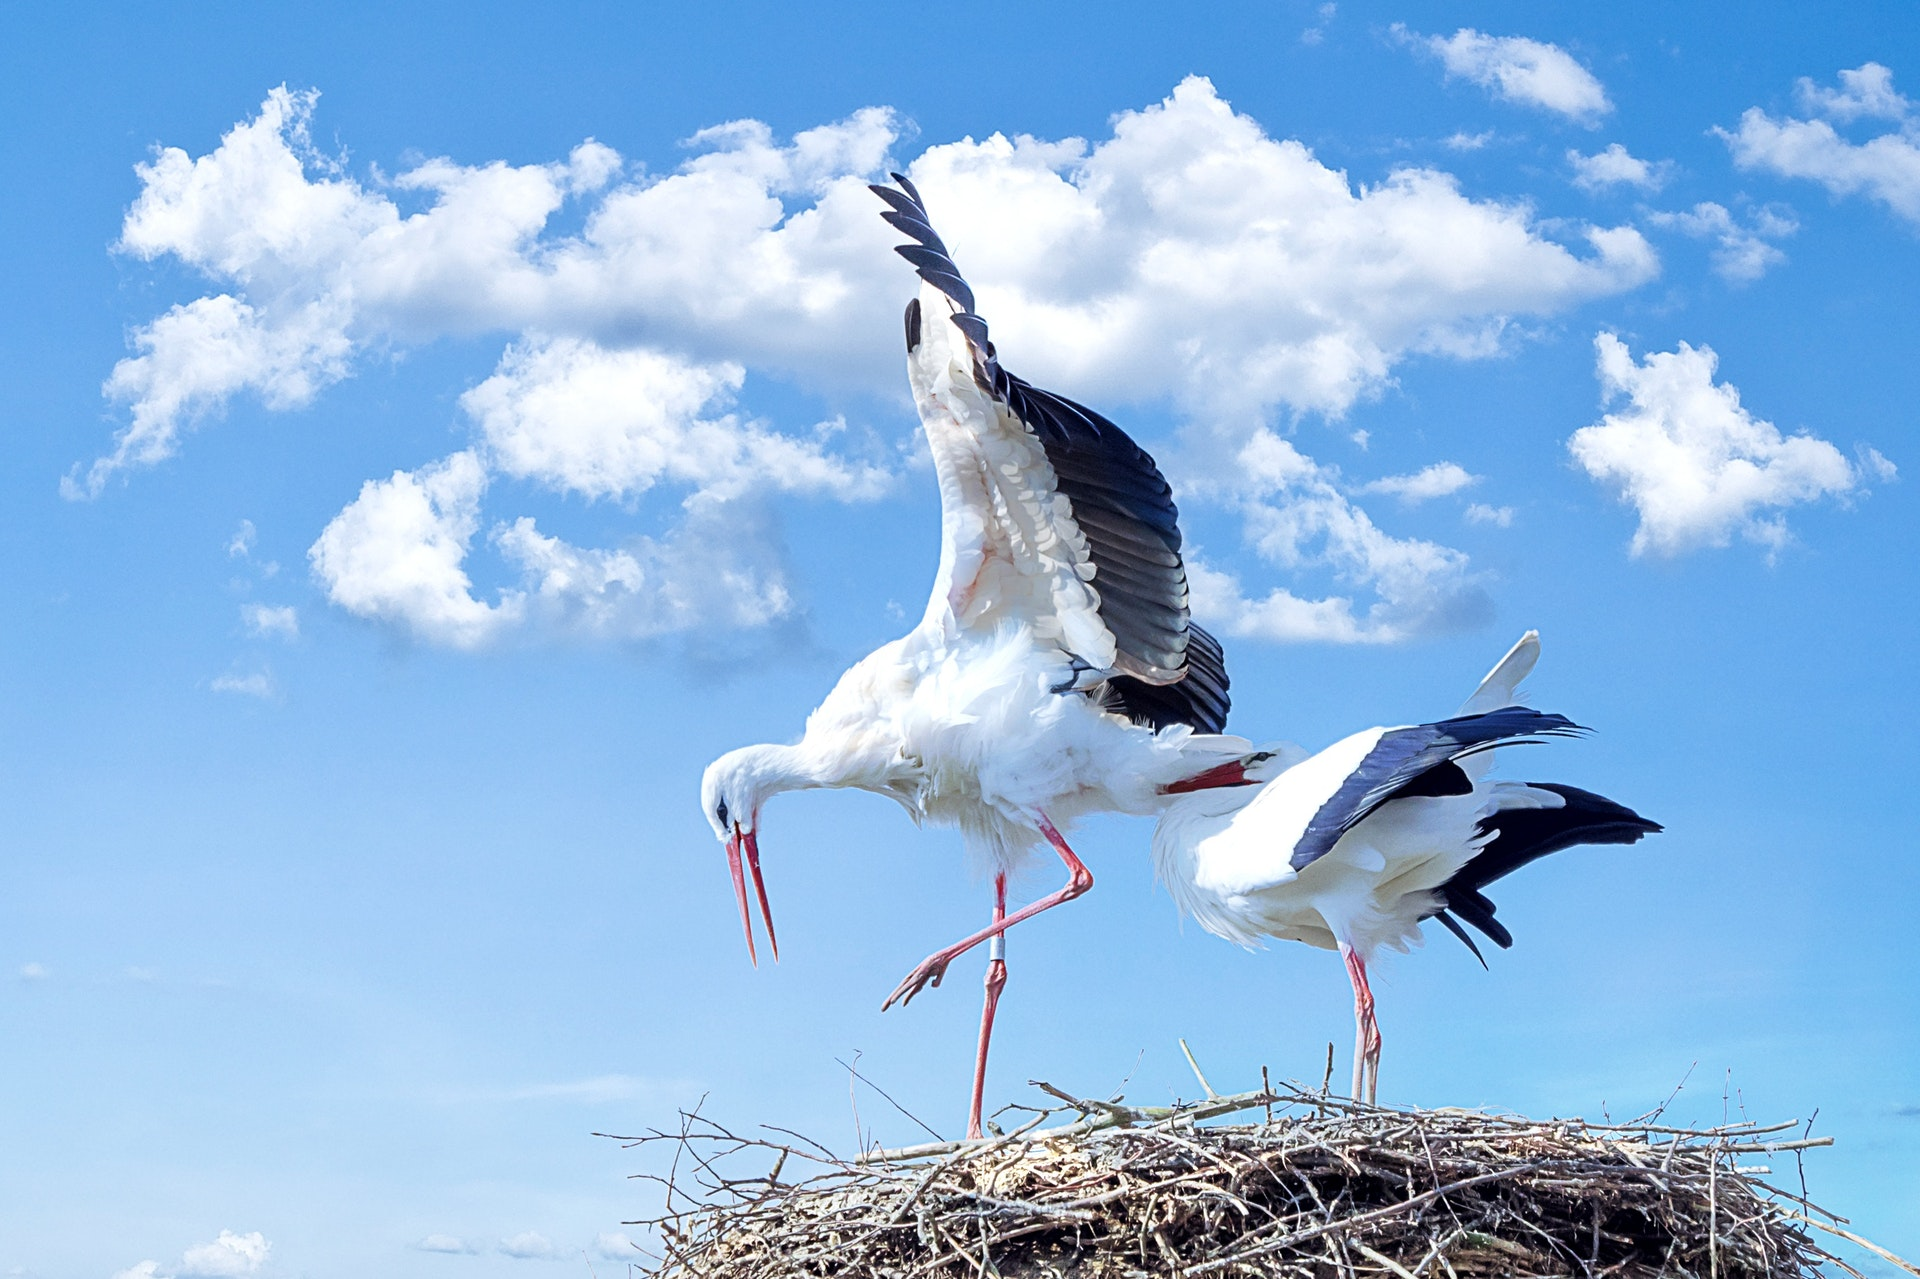 Stork, fugl, danmark, dyr, natur, dyreliv, rede